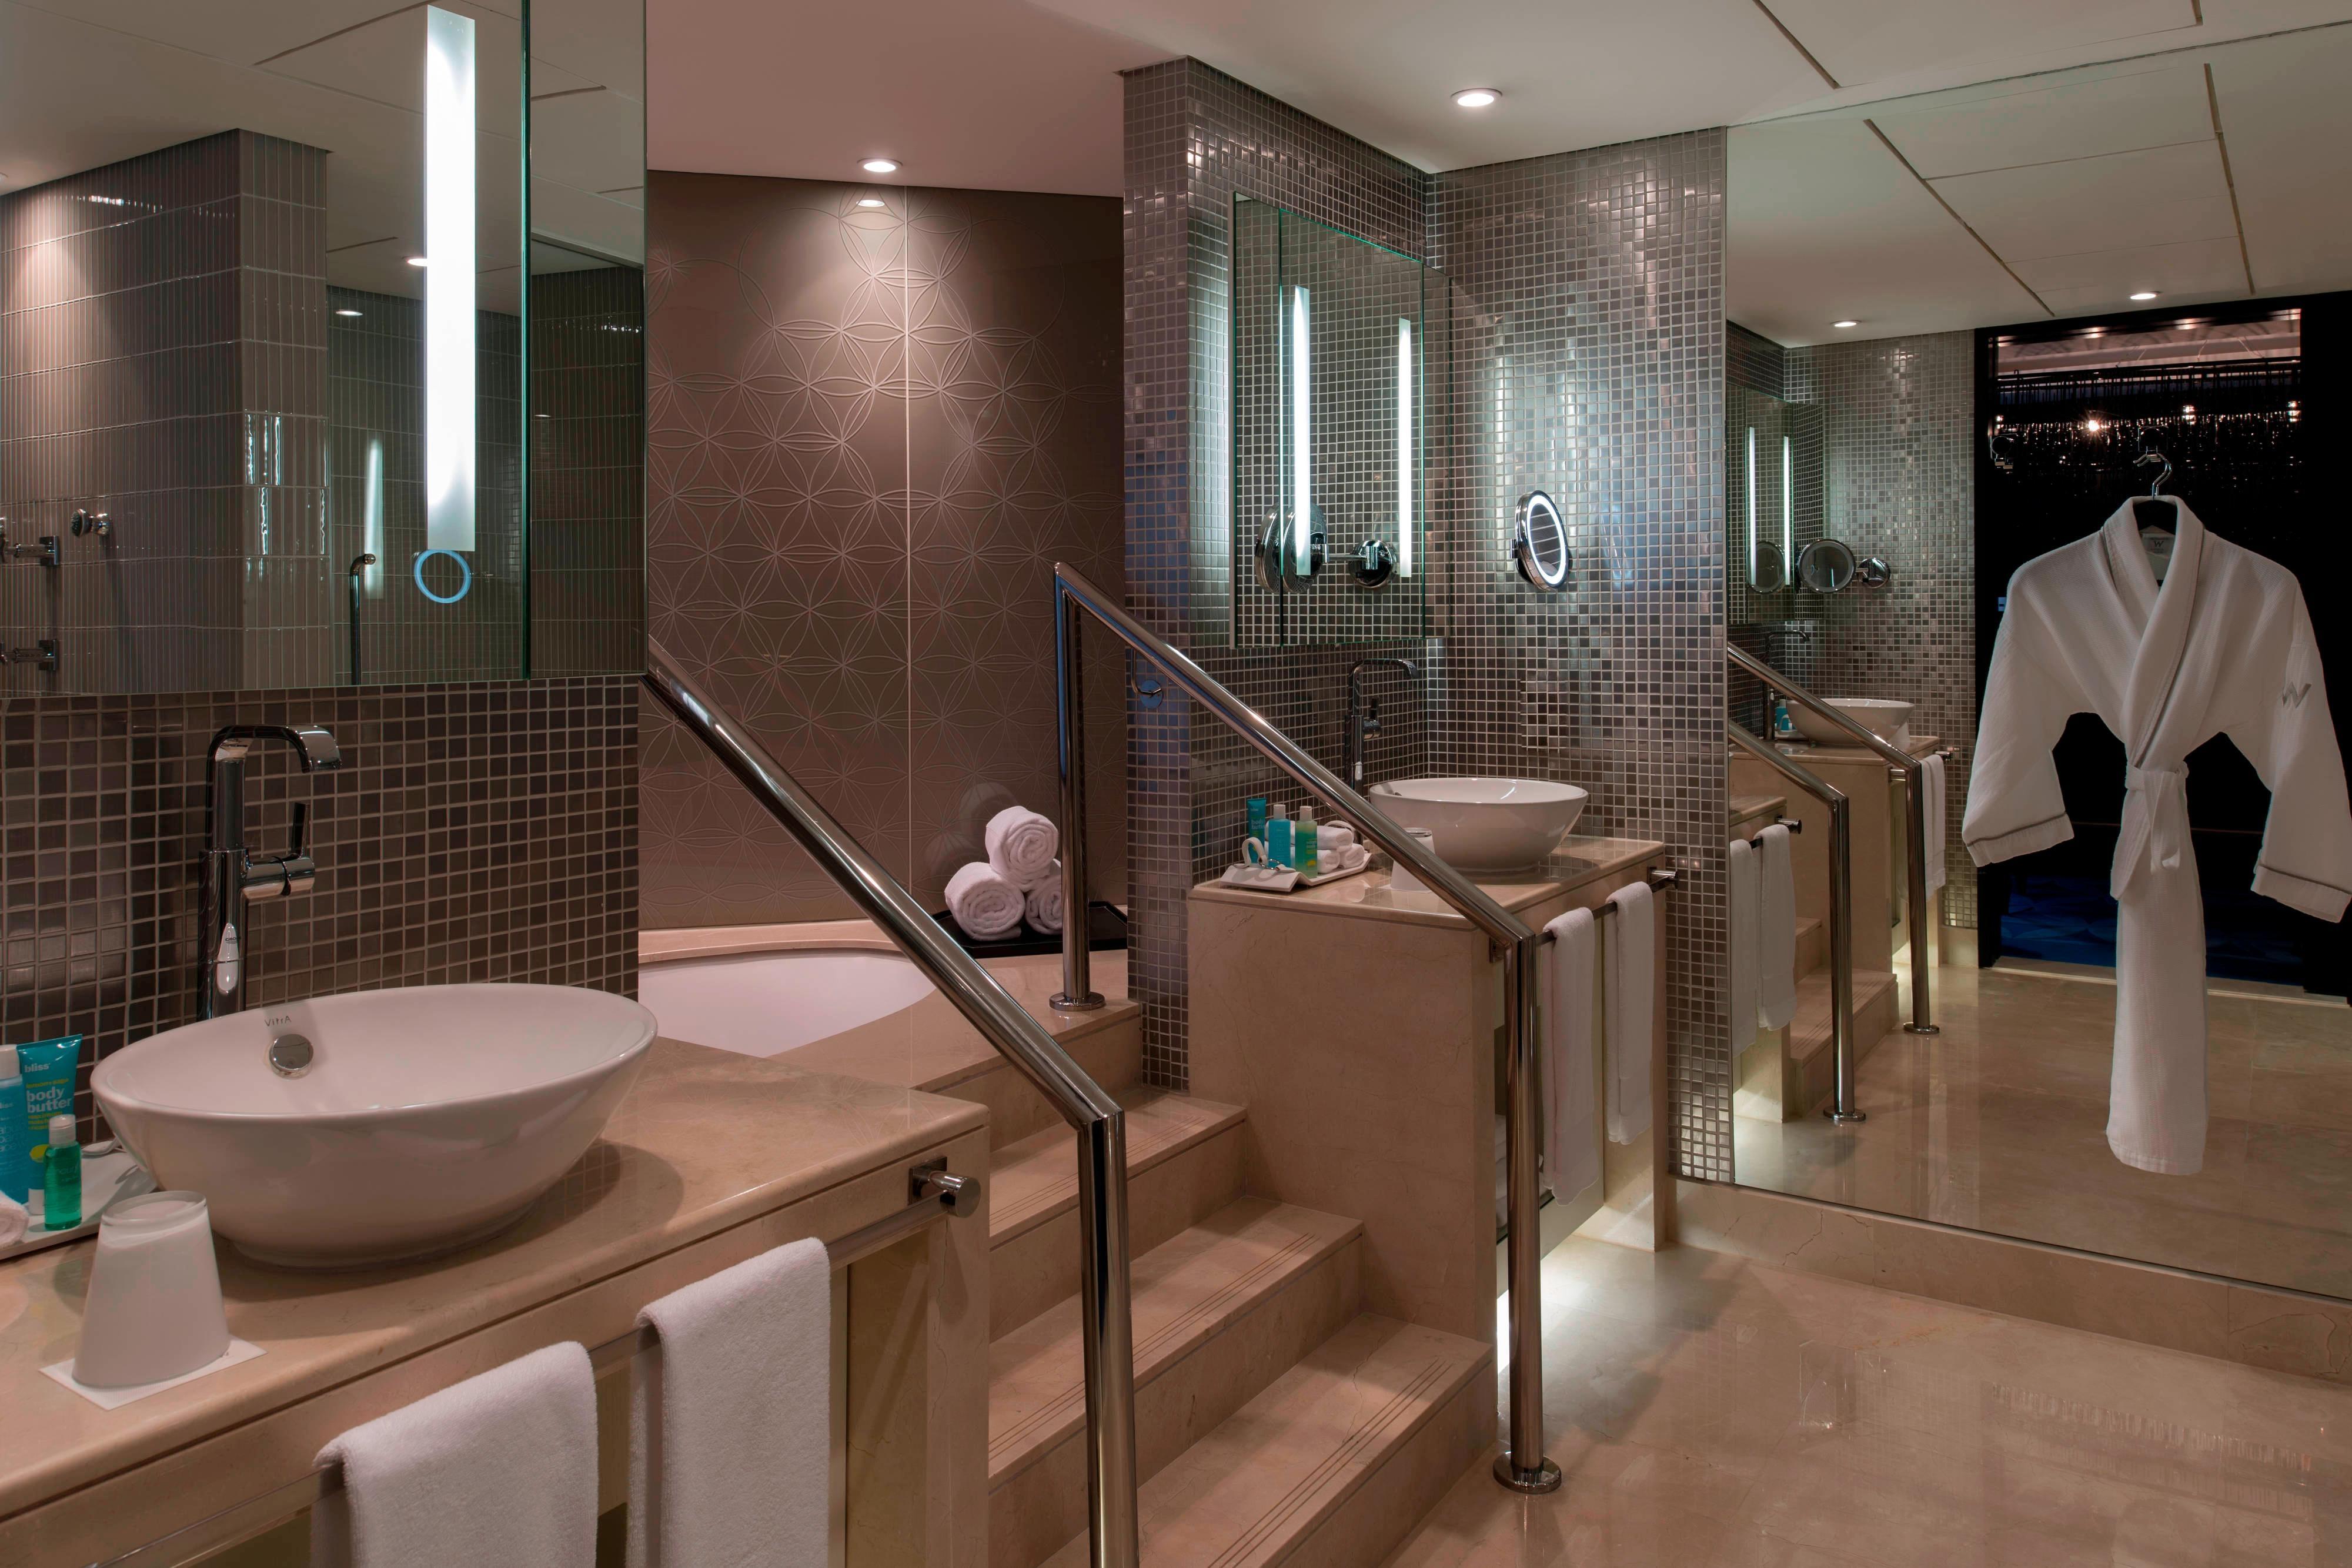 EWOW Suite - Bathroom